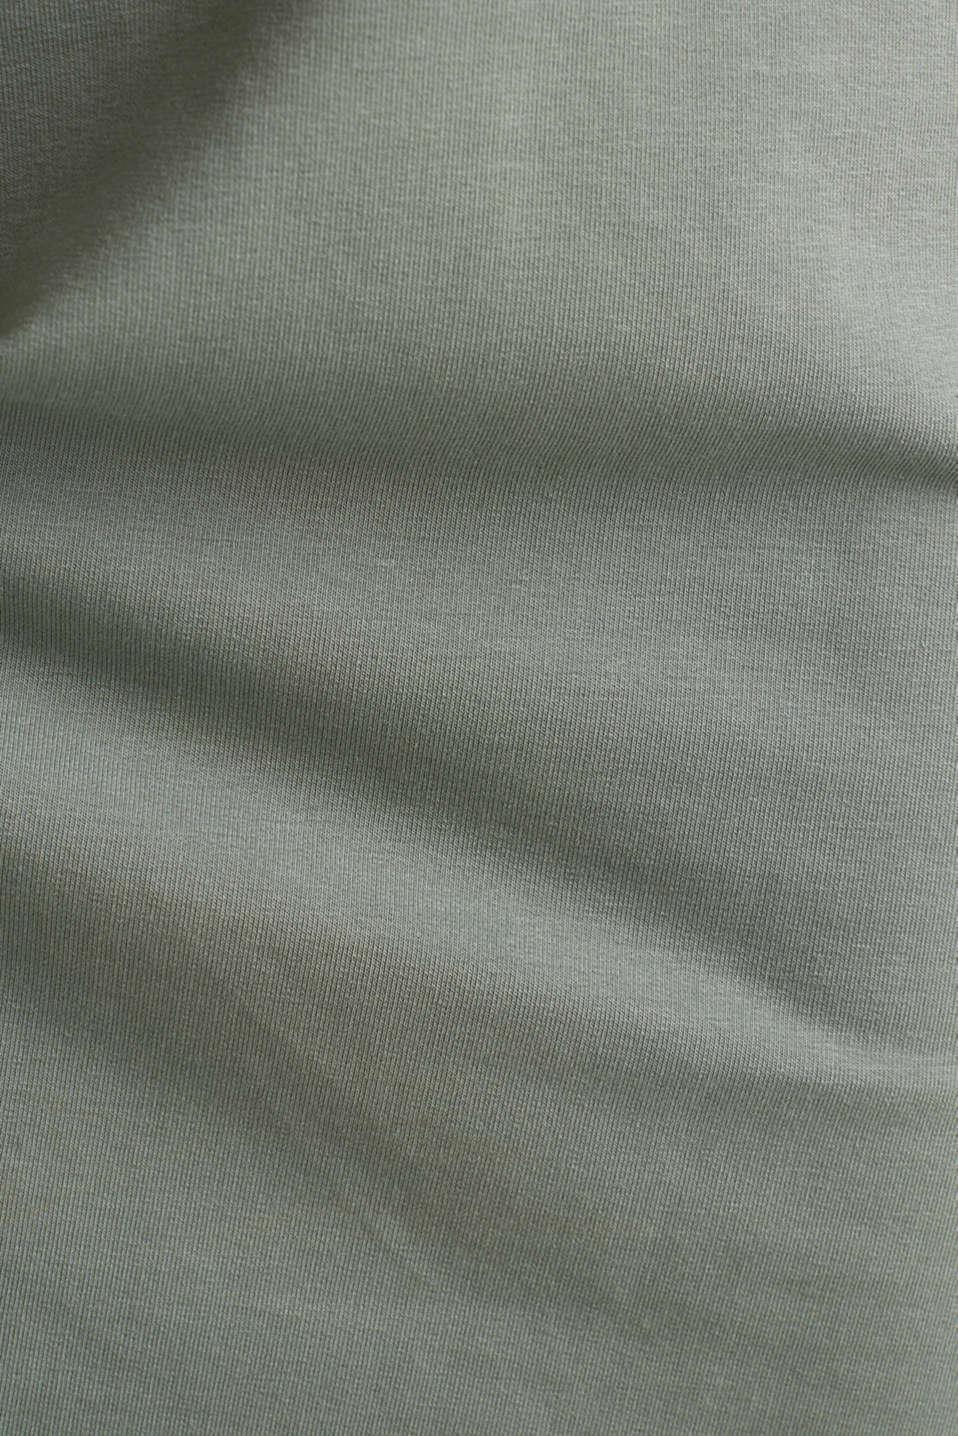 Stretch jersey dress with a high-low hem, LIGHT KHAKI, detail image number 2